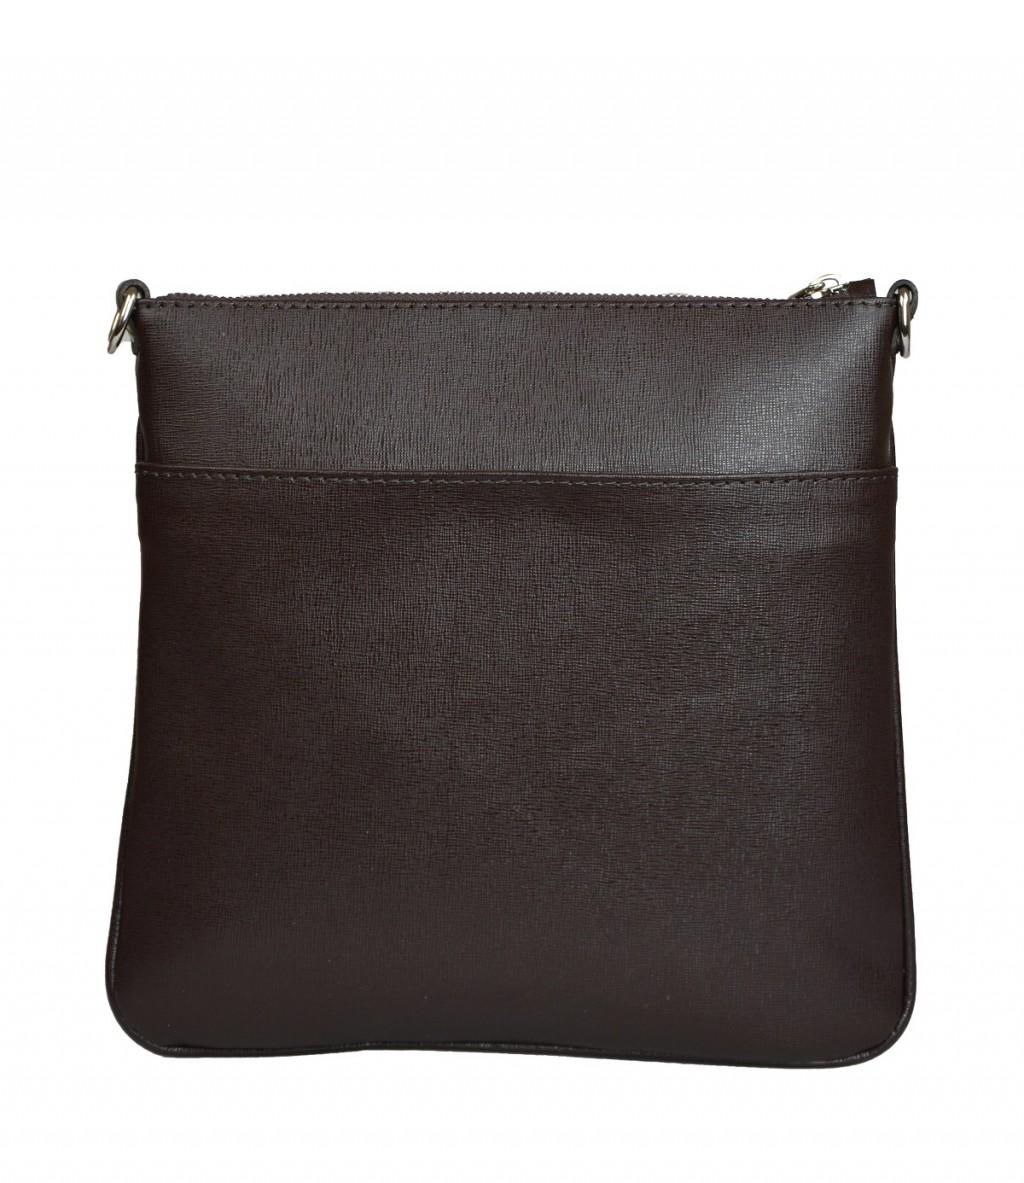 Dámská kožená kabelka FACEBAG VILMA -Tmavá hnědá